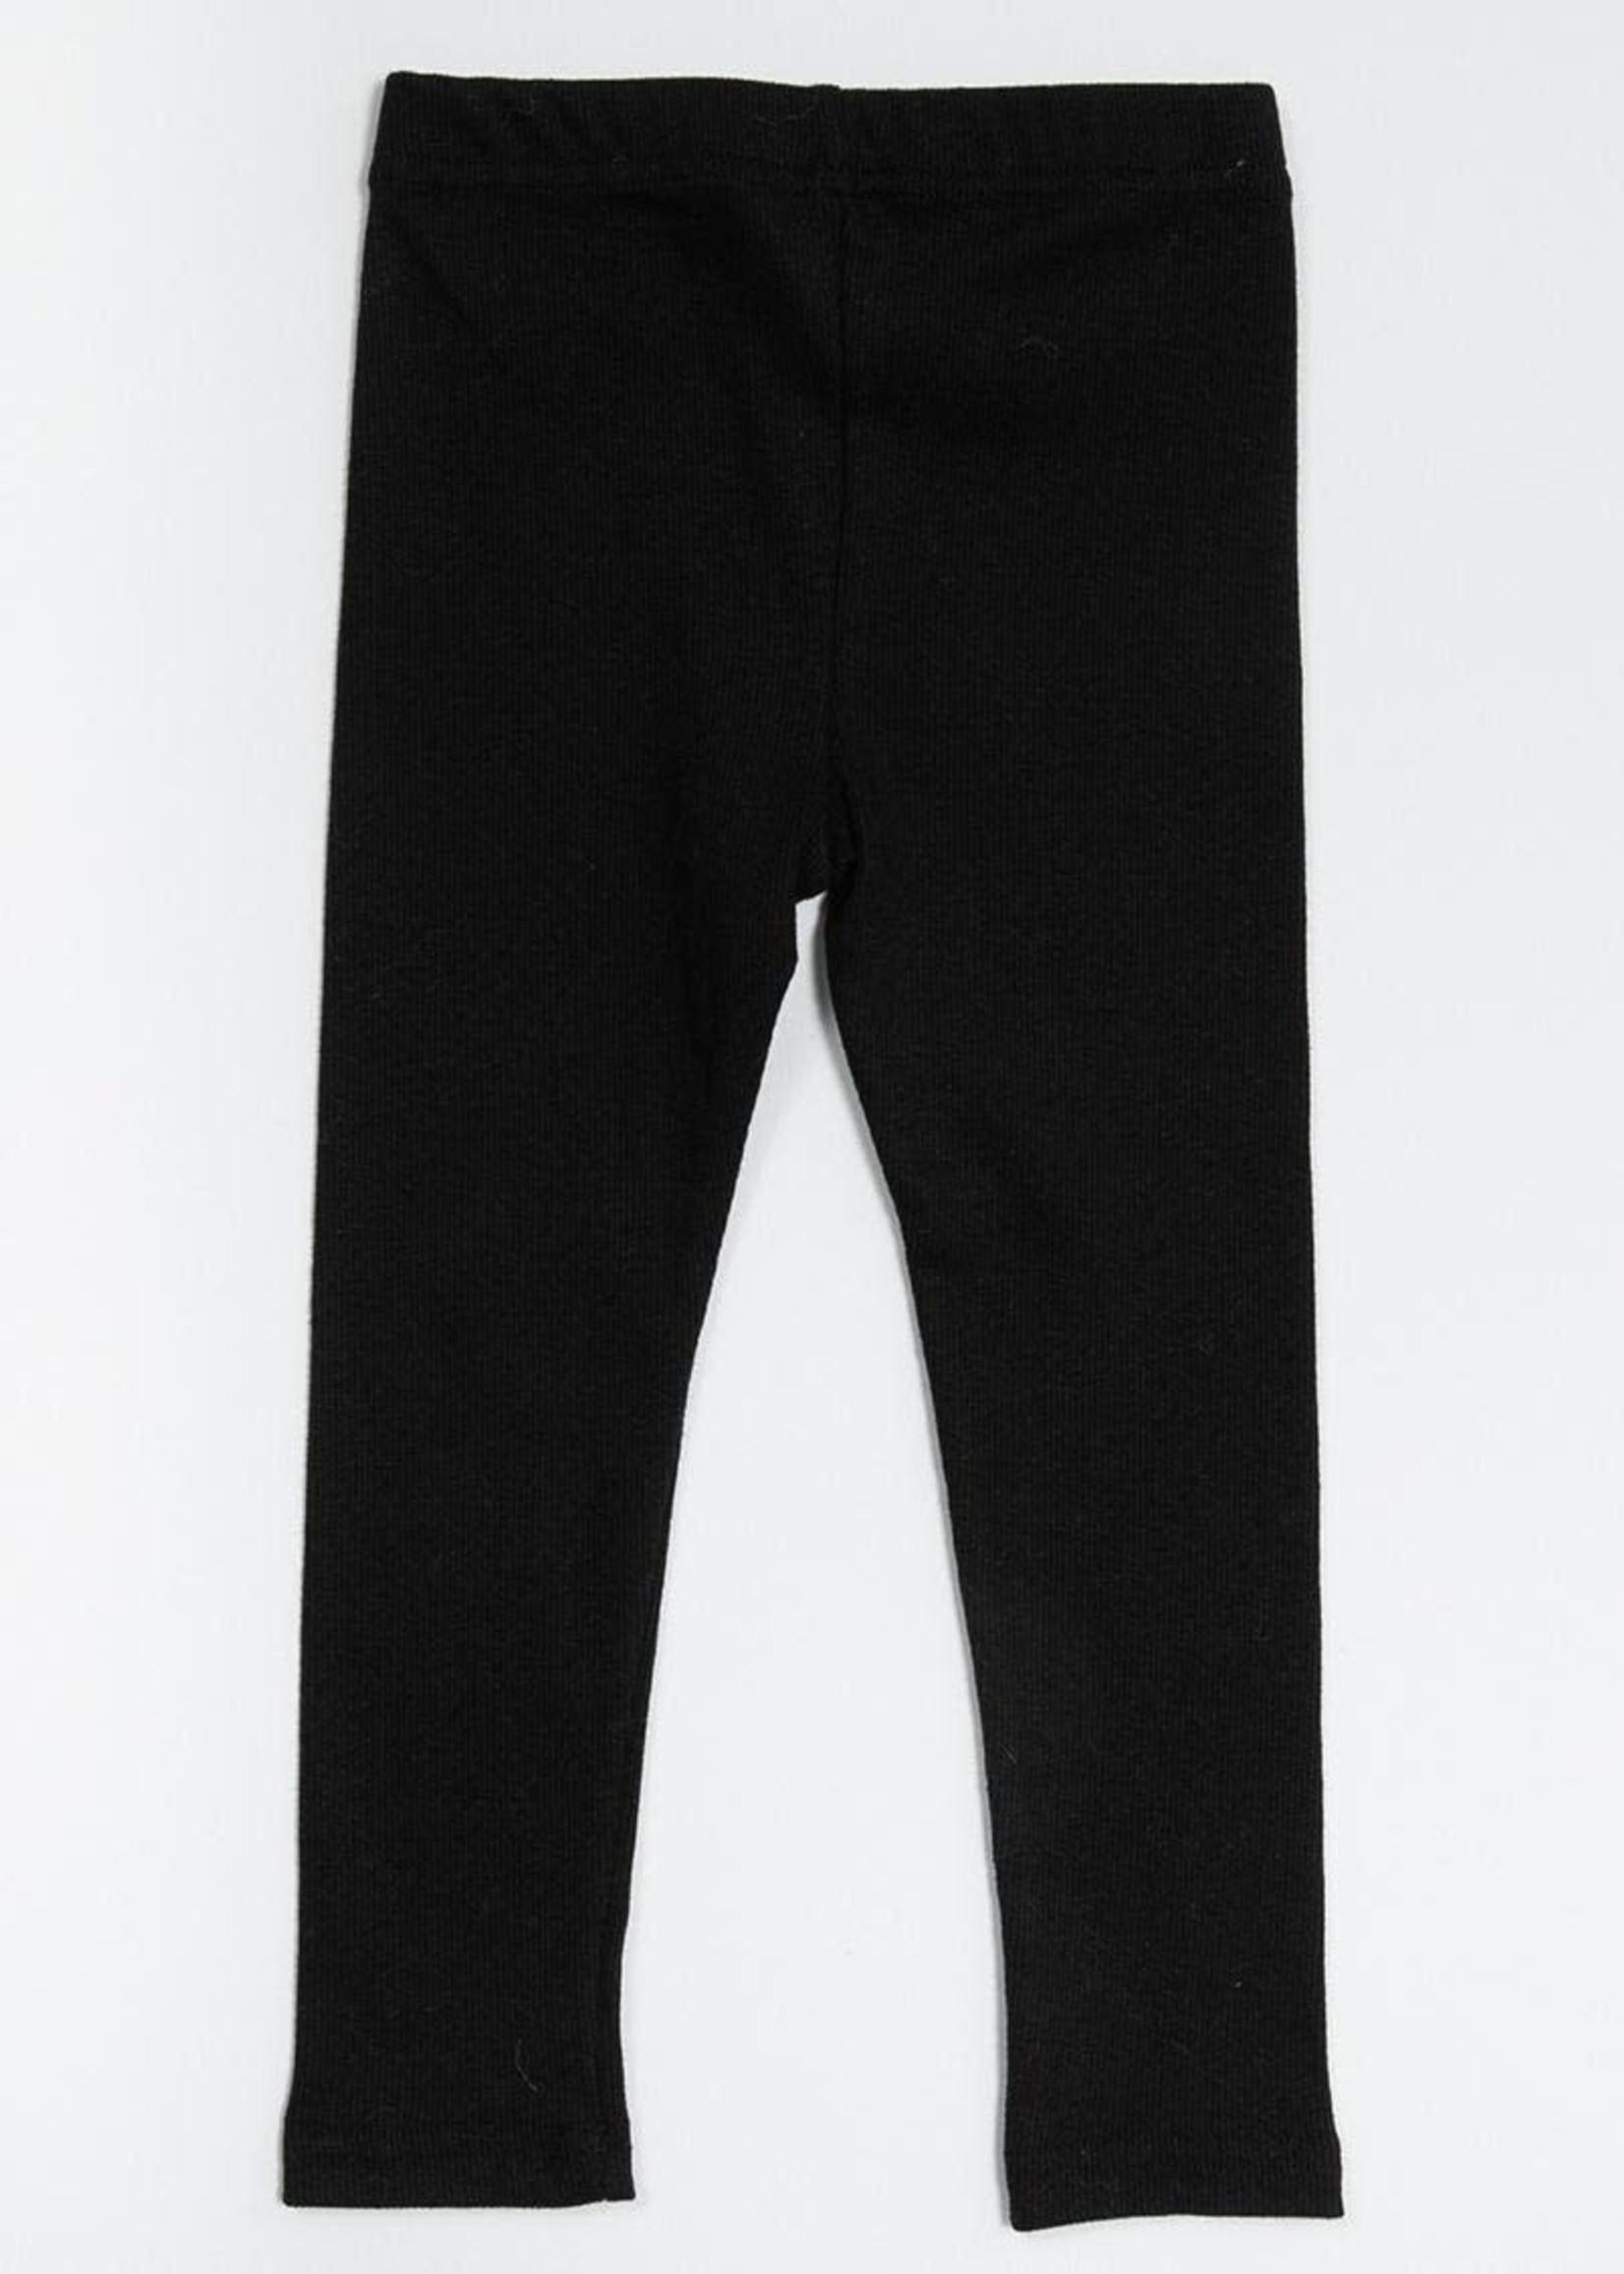 Petite Hailey PH Ribbed Leggings (Black)